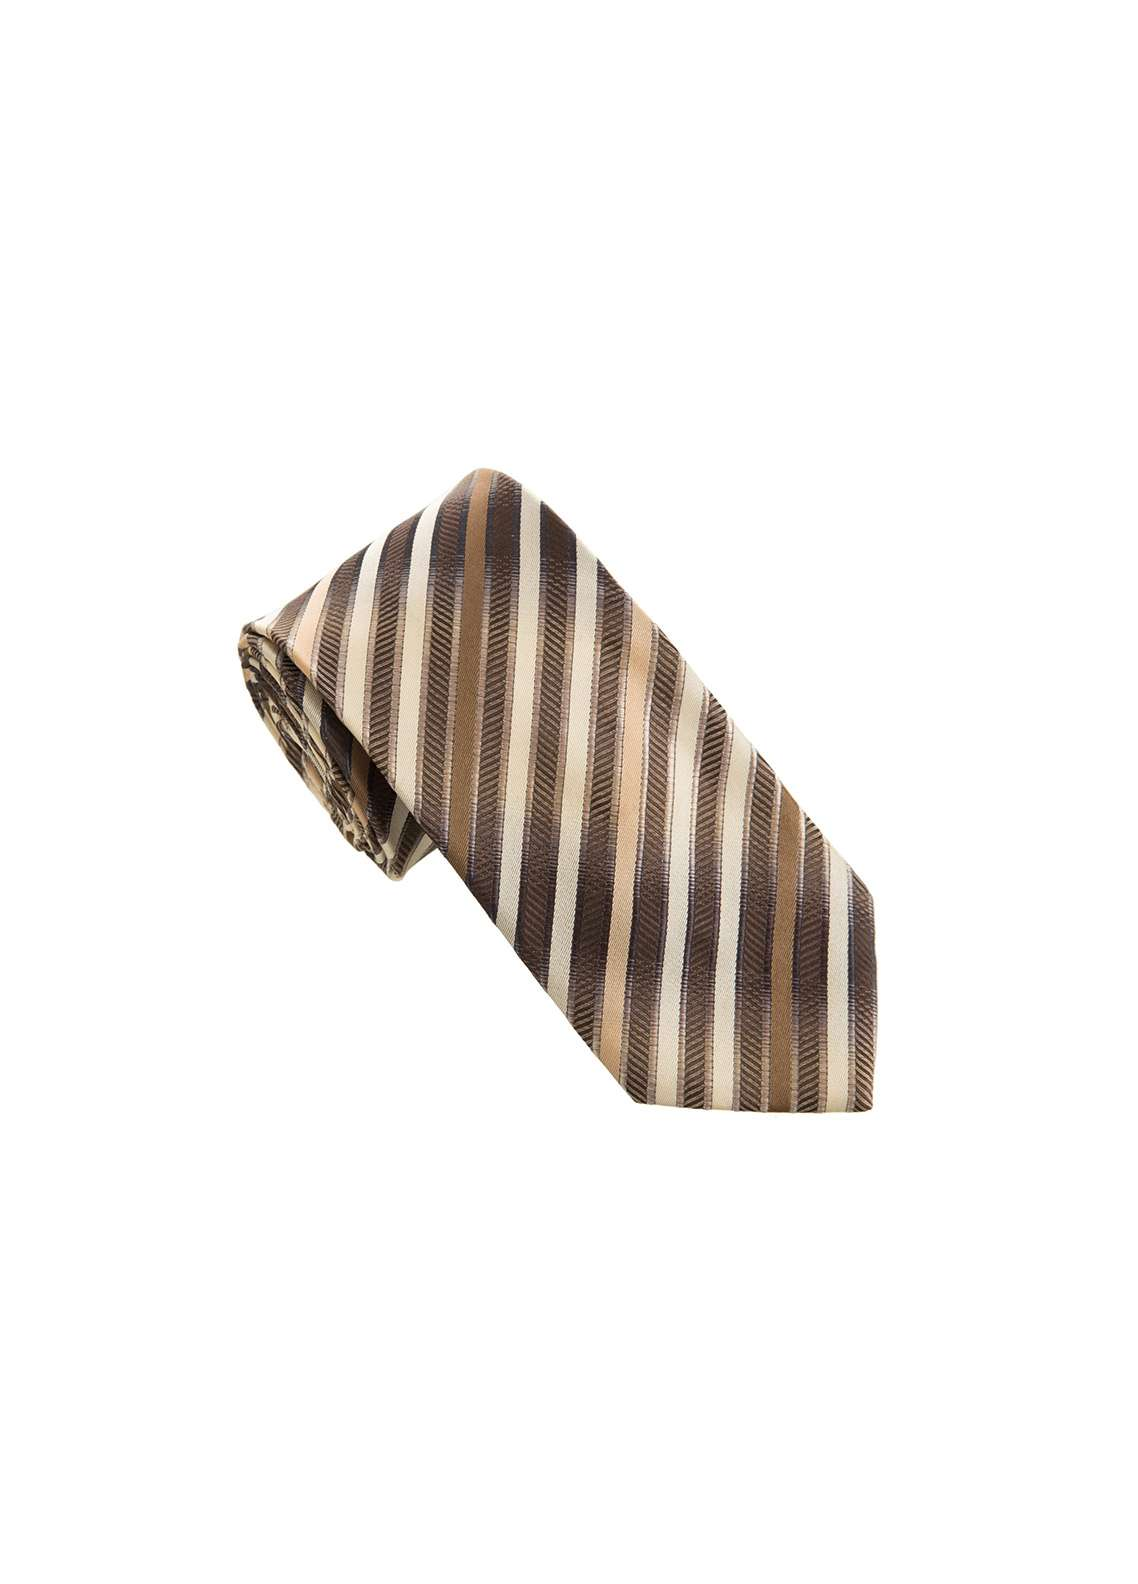 The Gentlemen's Club Brown Striped Silk Tie for Men